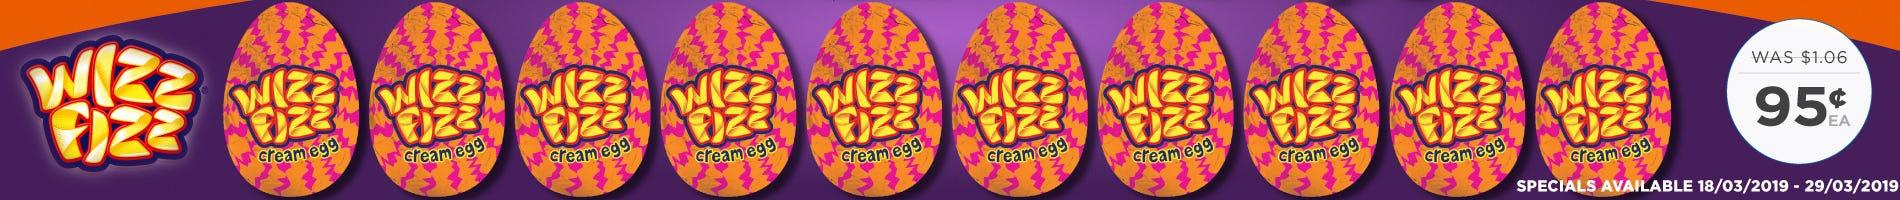 Click to Shop Wizz Fizz Cream Egg